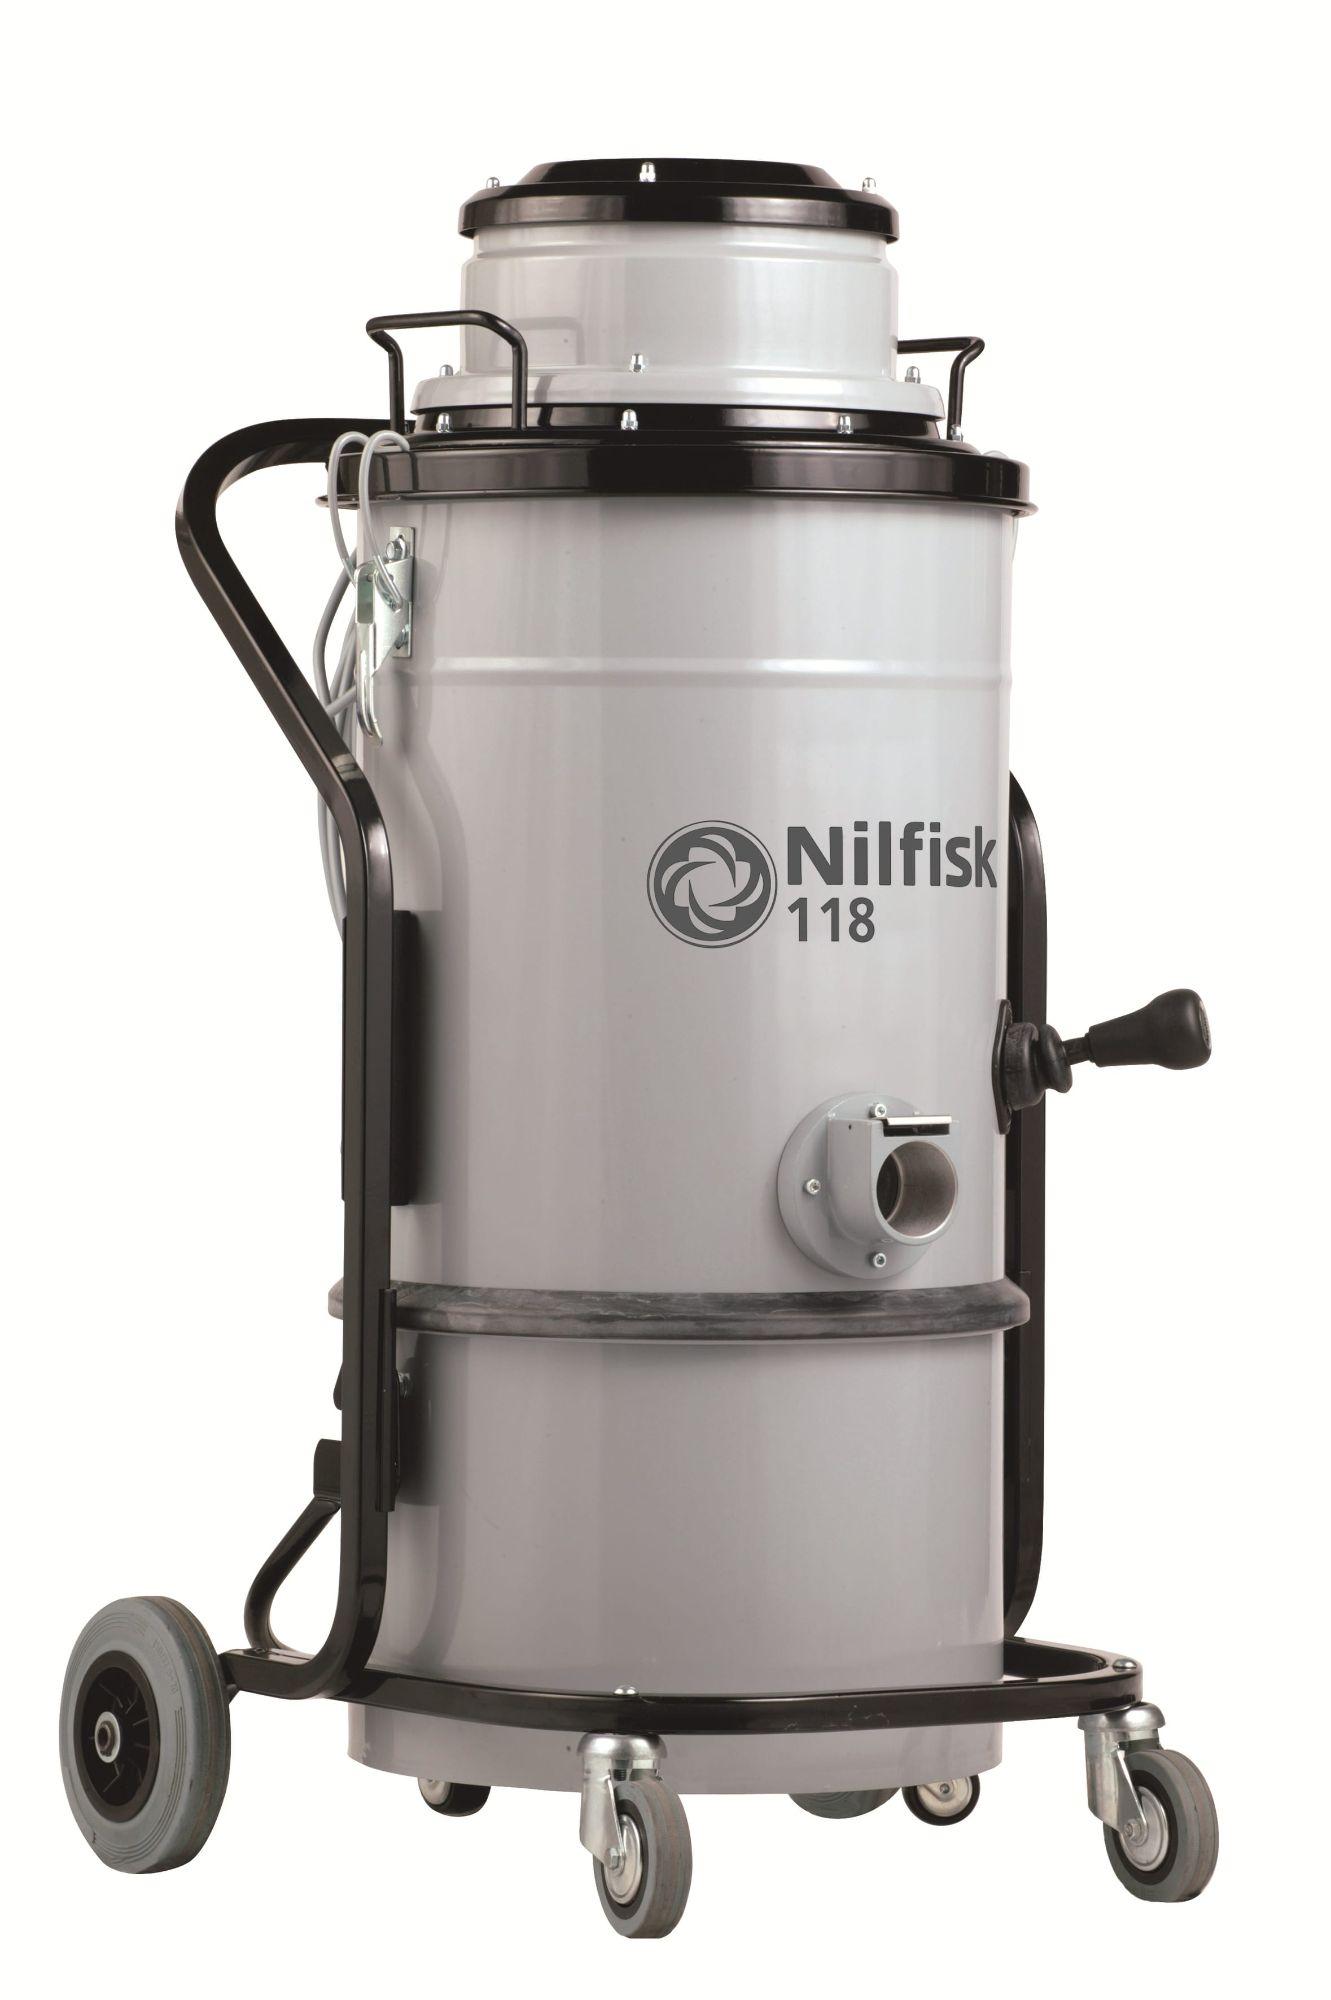 Nilfisk 118